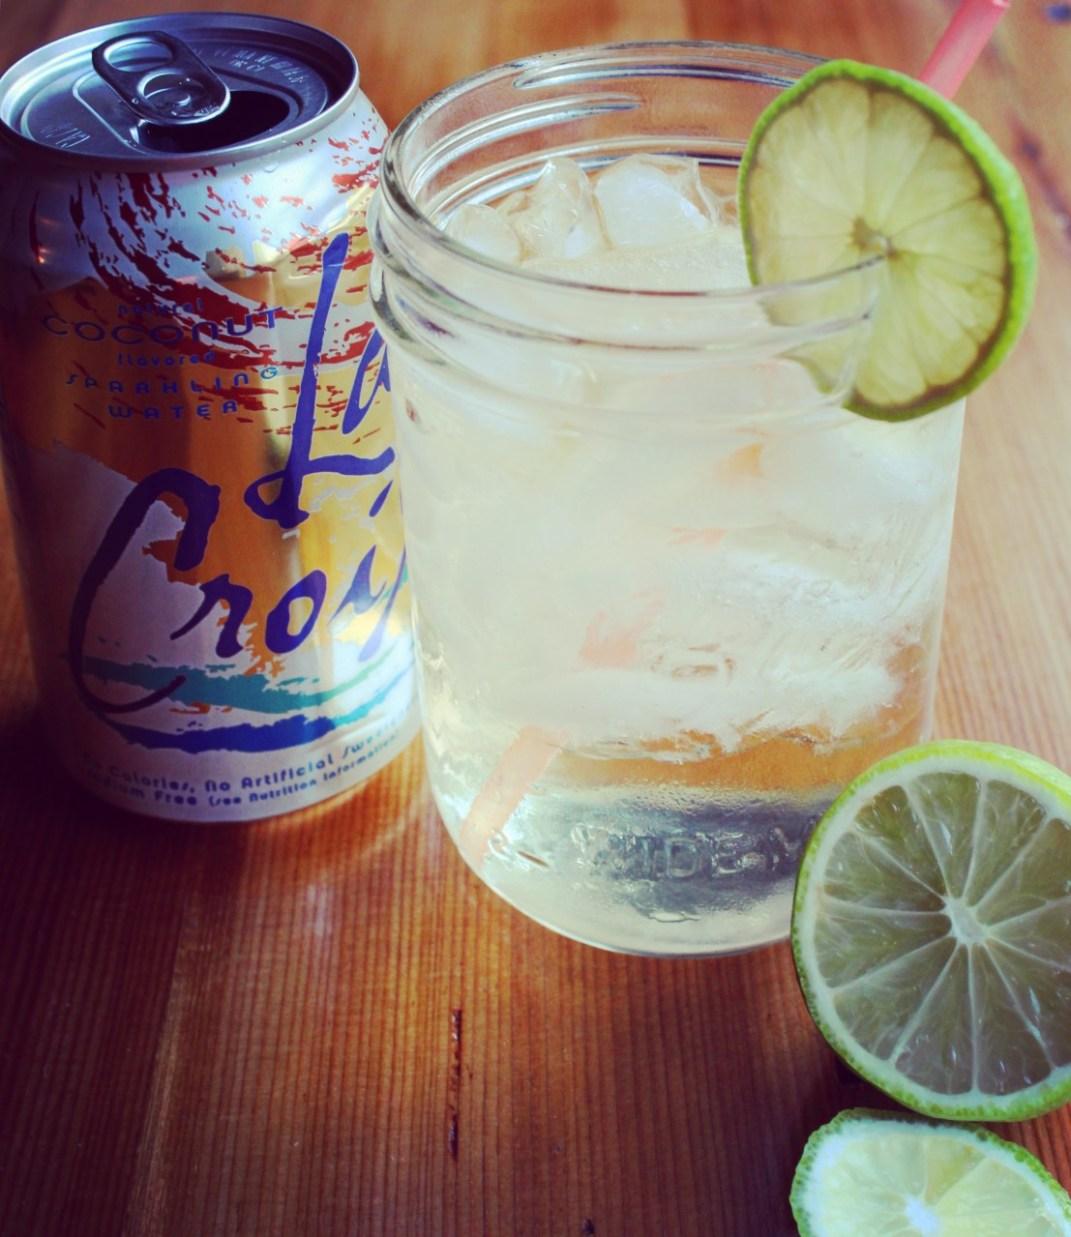 Soconut Summer Cocktail - Ginger Hultin, RDChampagne Nutrition